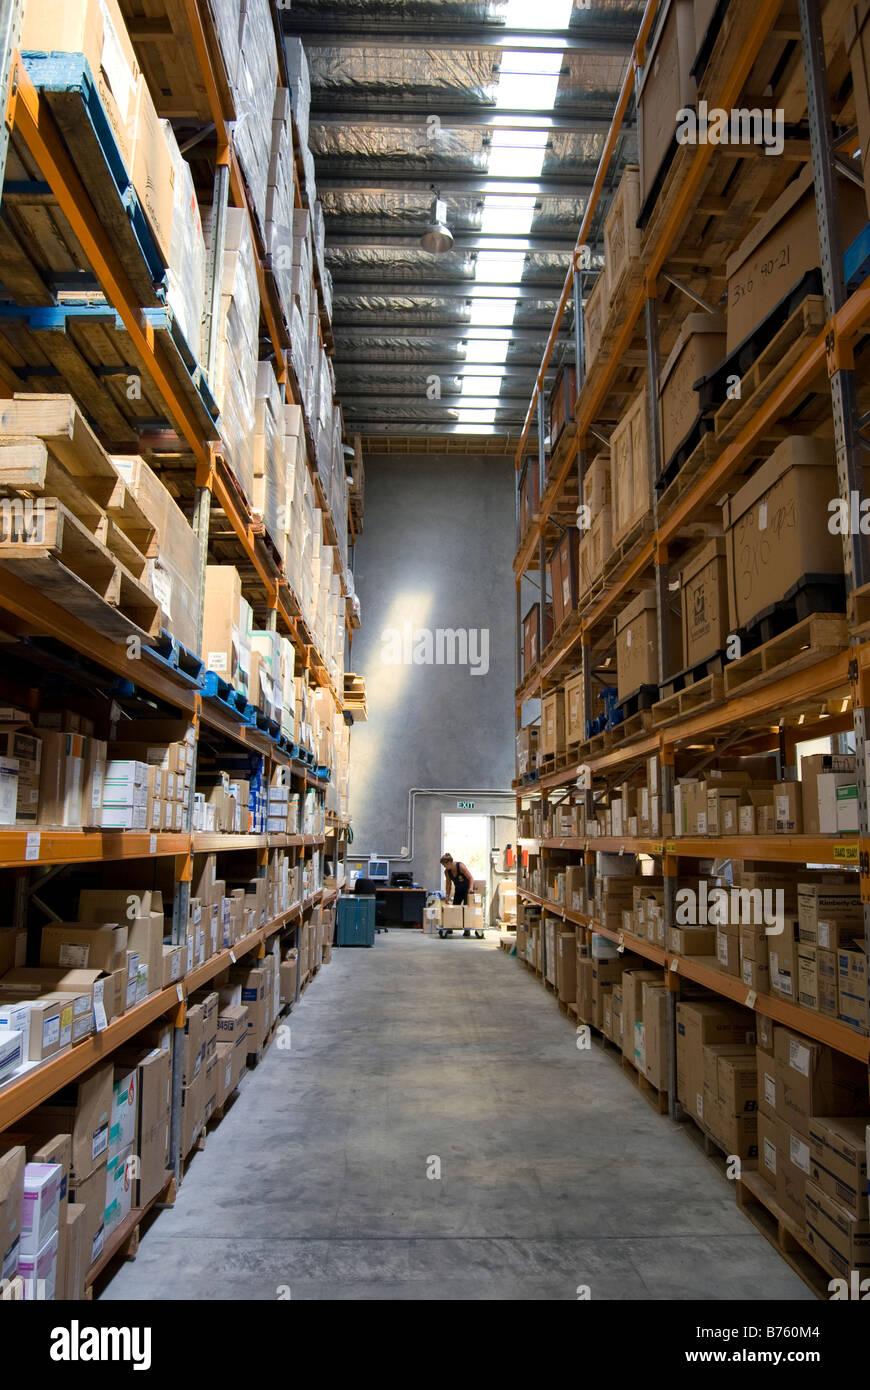 Large Warehouse Interior Online Distribution Stockfotos & Large ...